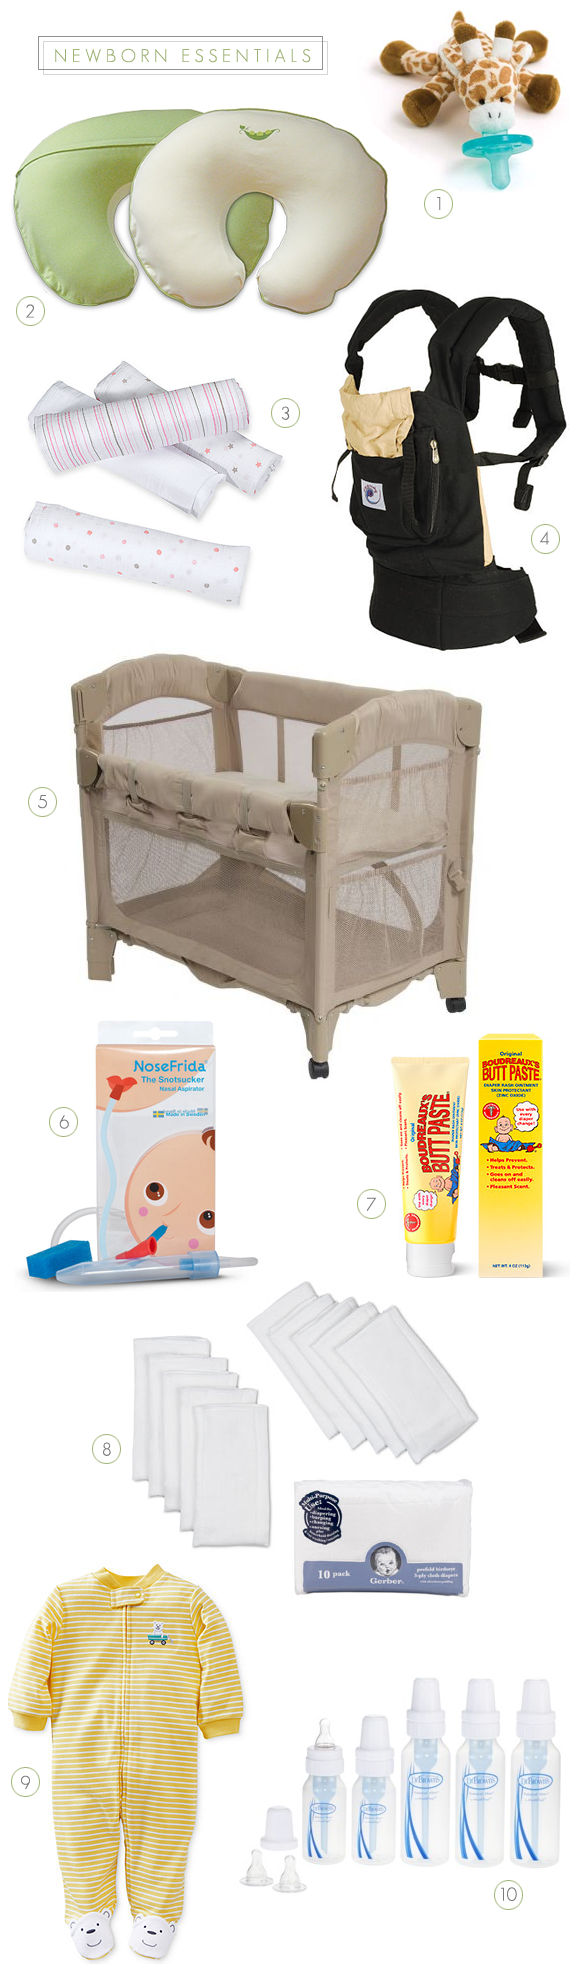 10 Essential Newborn Products